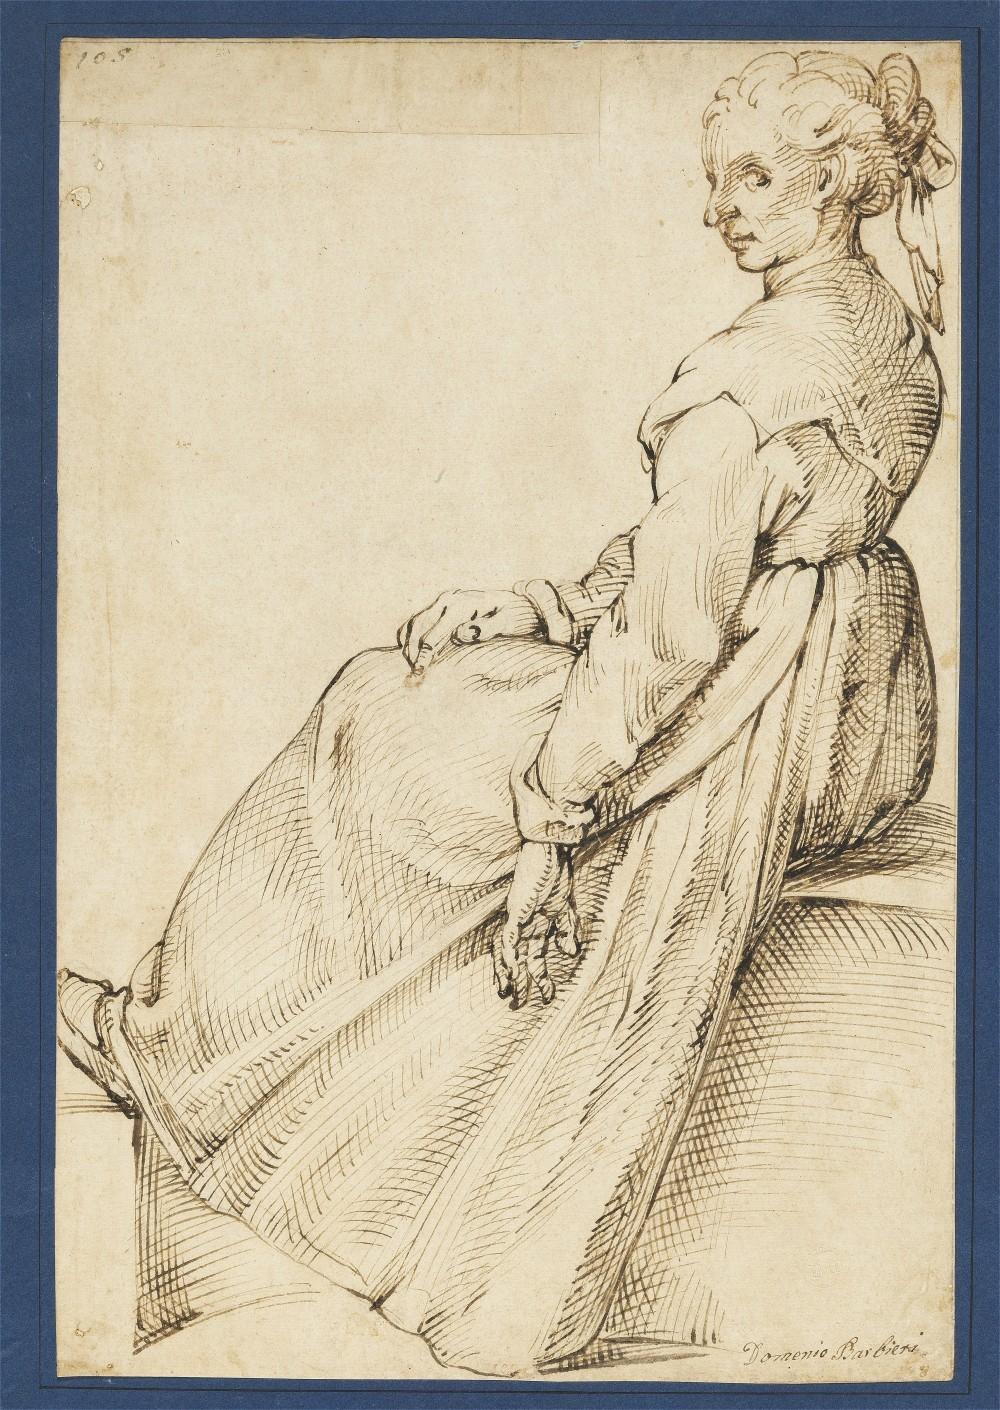 Bartolomeo Passarotti « A seated woman looking backwards », image ©Bruun Rasmussen